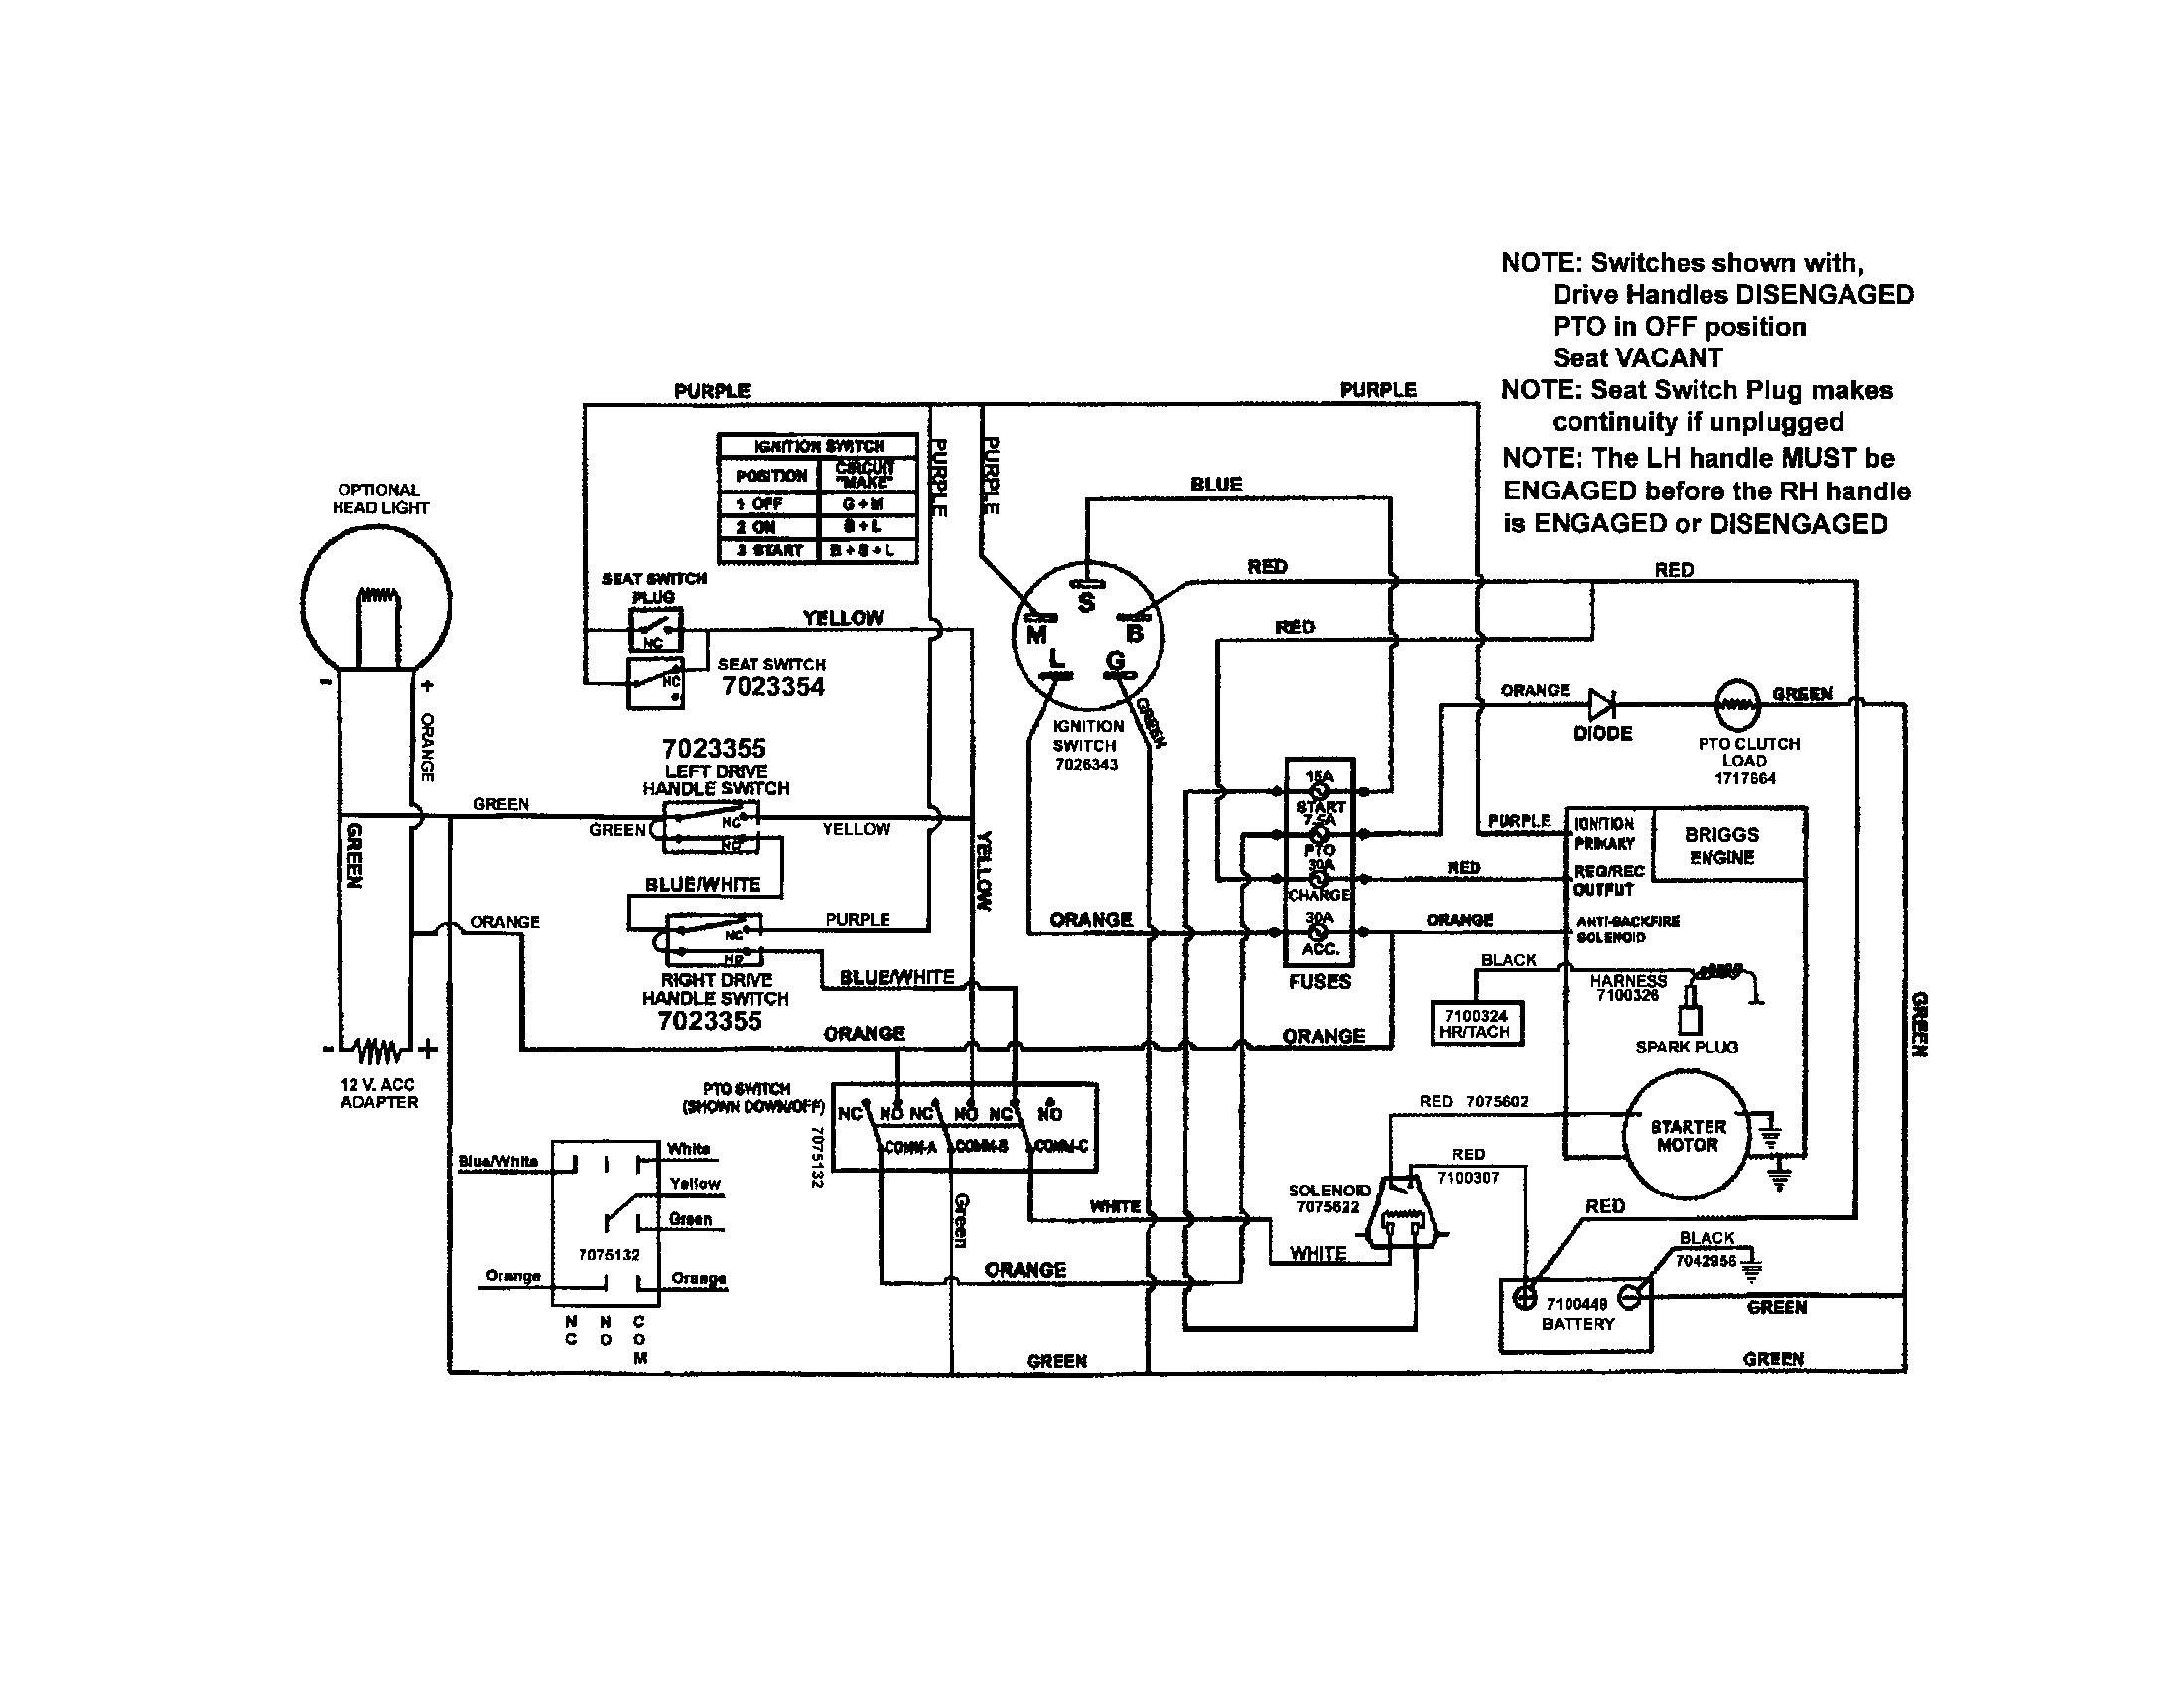 20 Hp Briggs Vanguard Engine Parts Diagram Wiring - Wiring Diagram Data - Briggs And Stratton Wiring Diagram